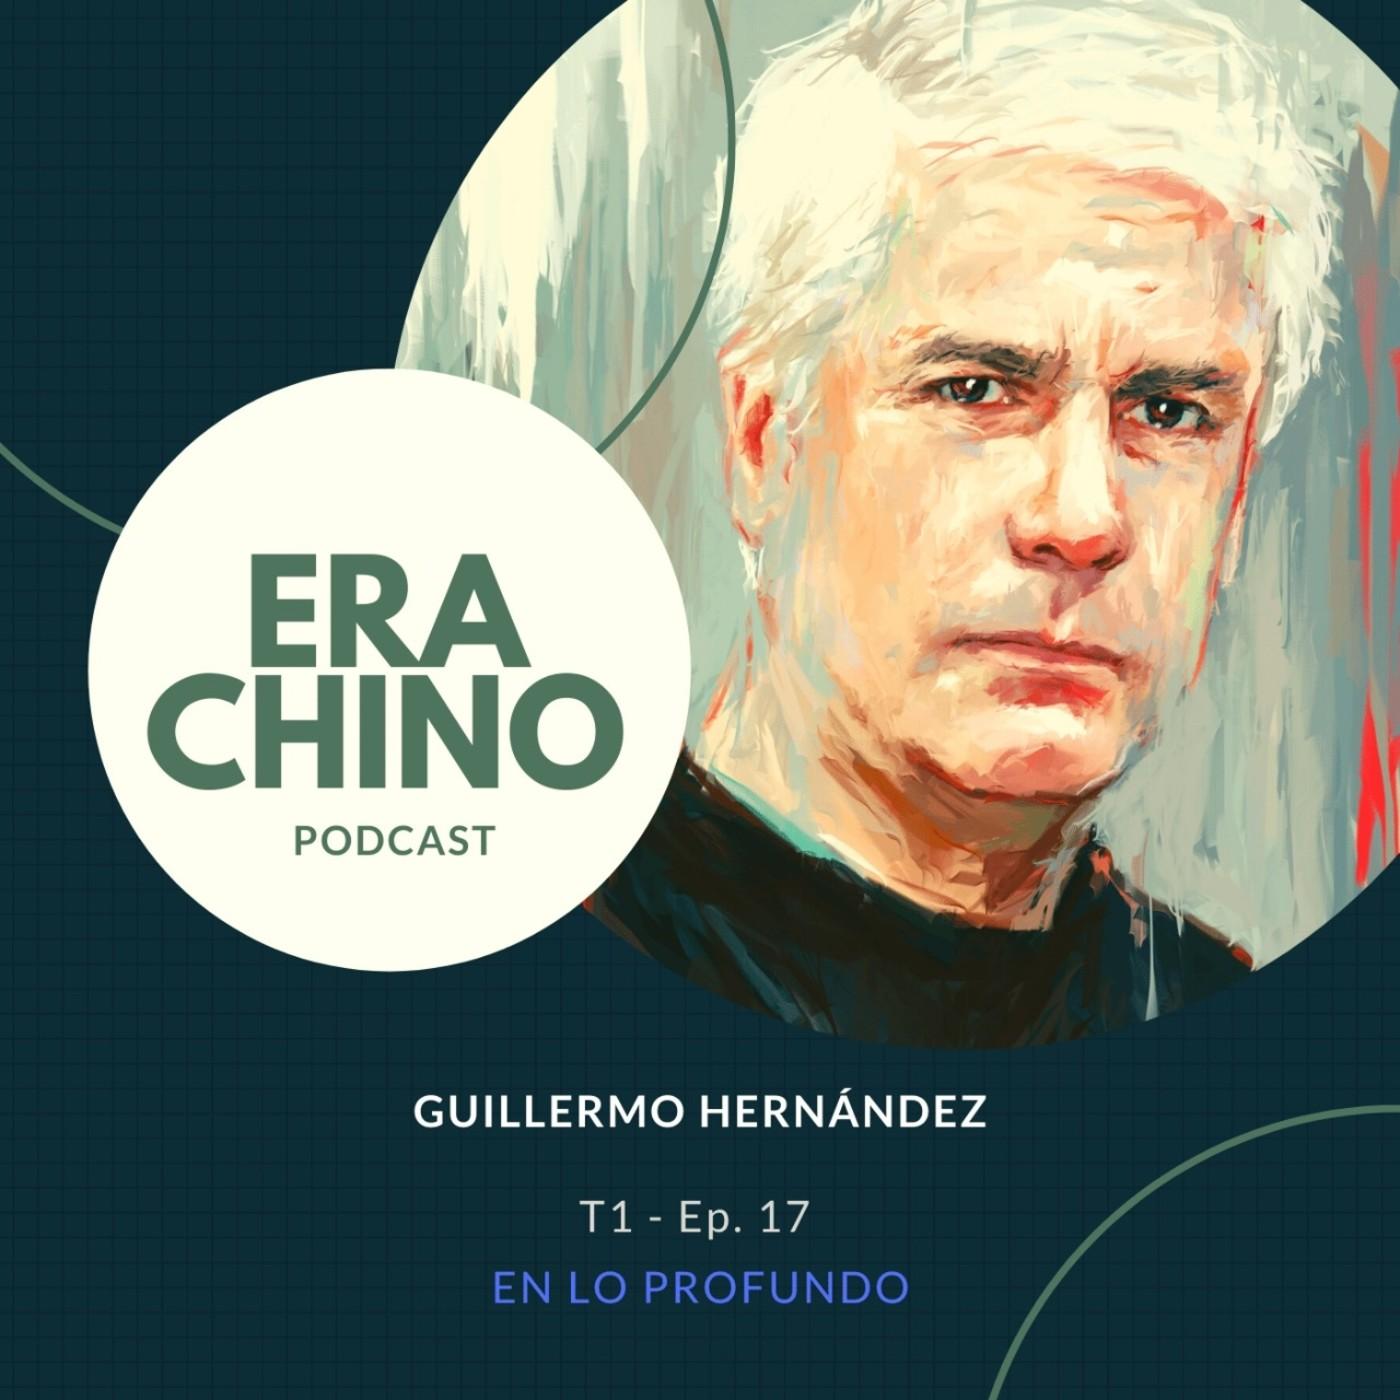 Era Chino T01E17 : En Lo Profundo.